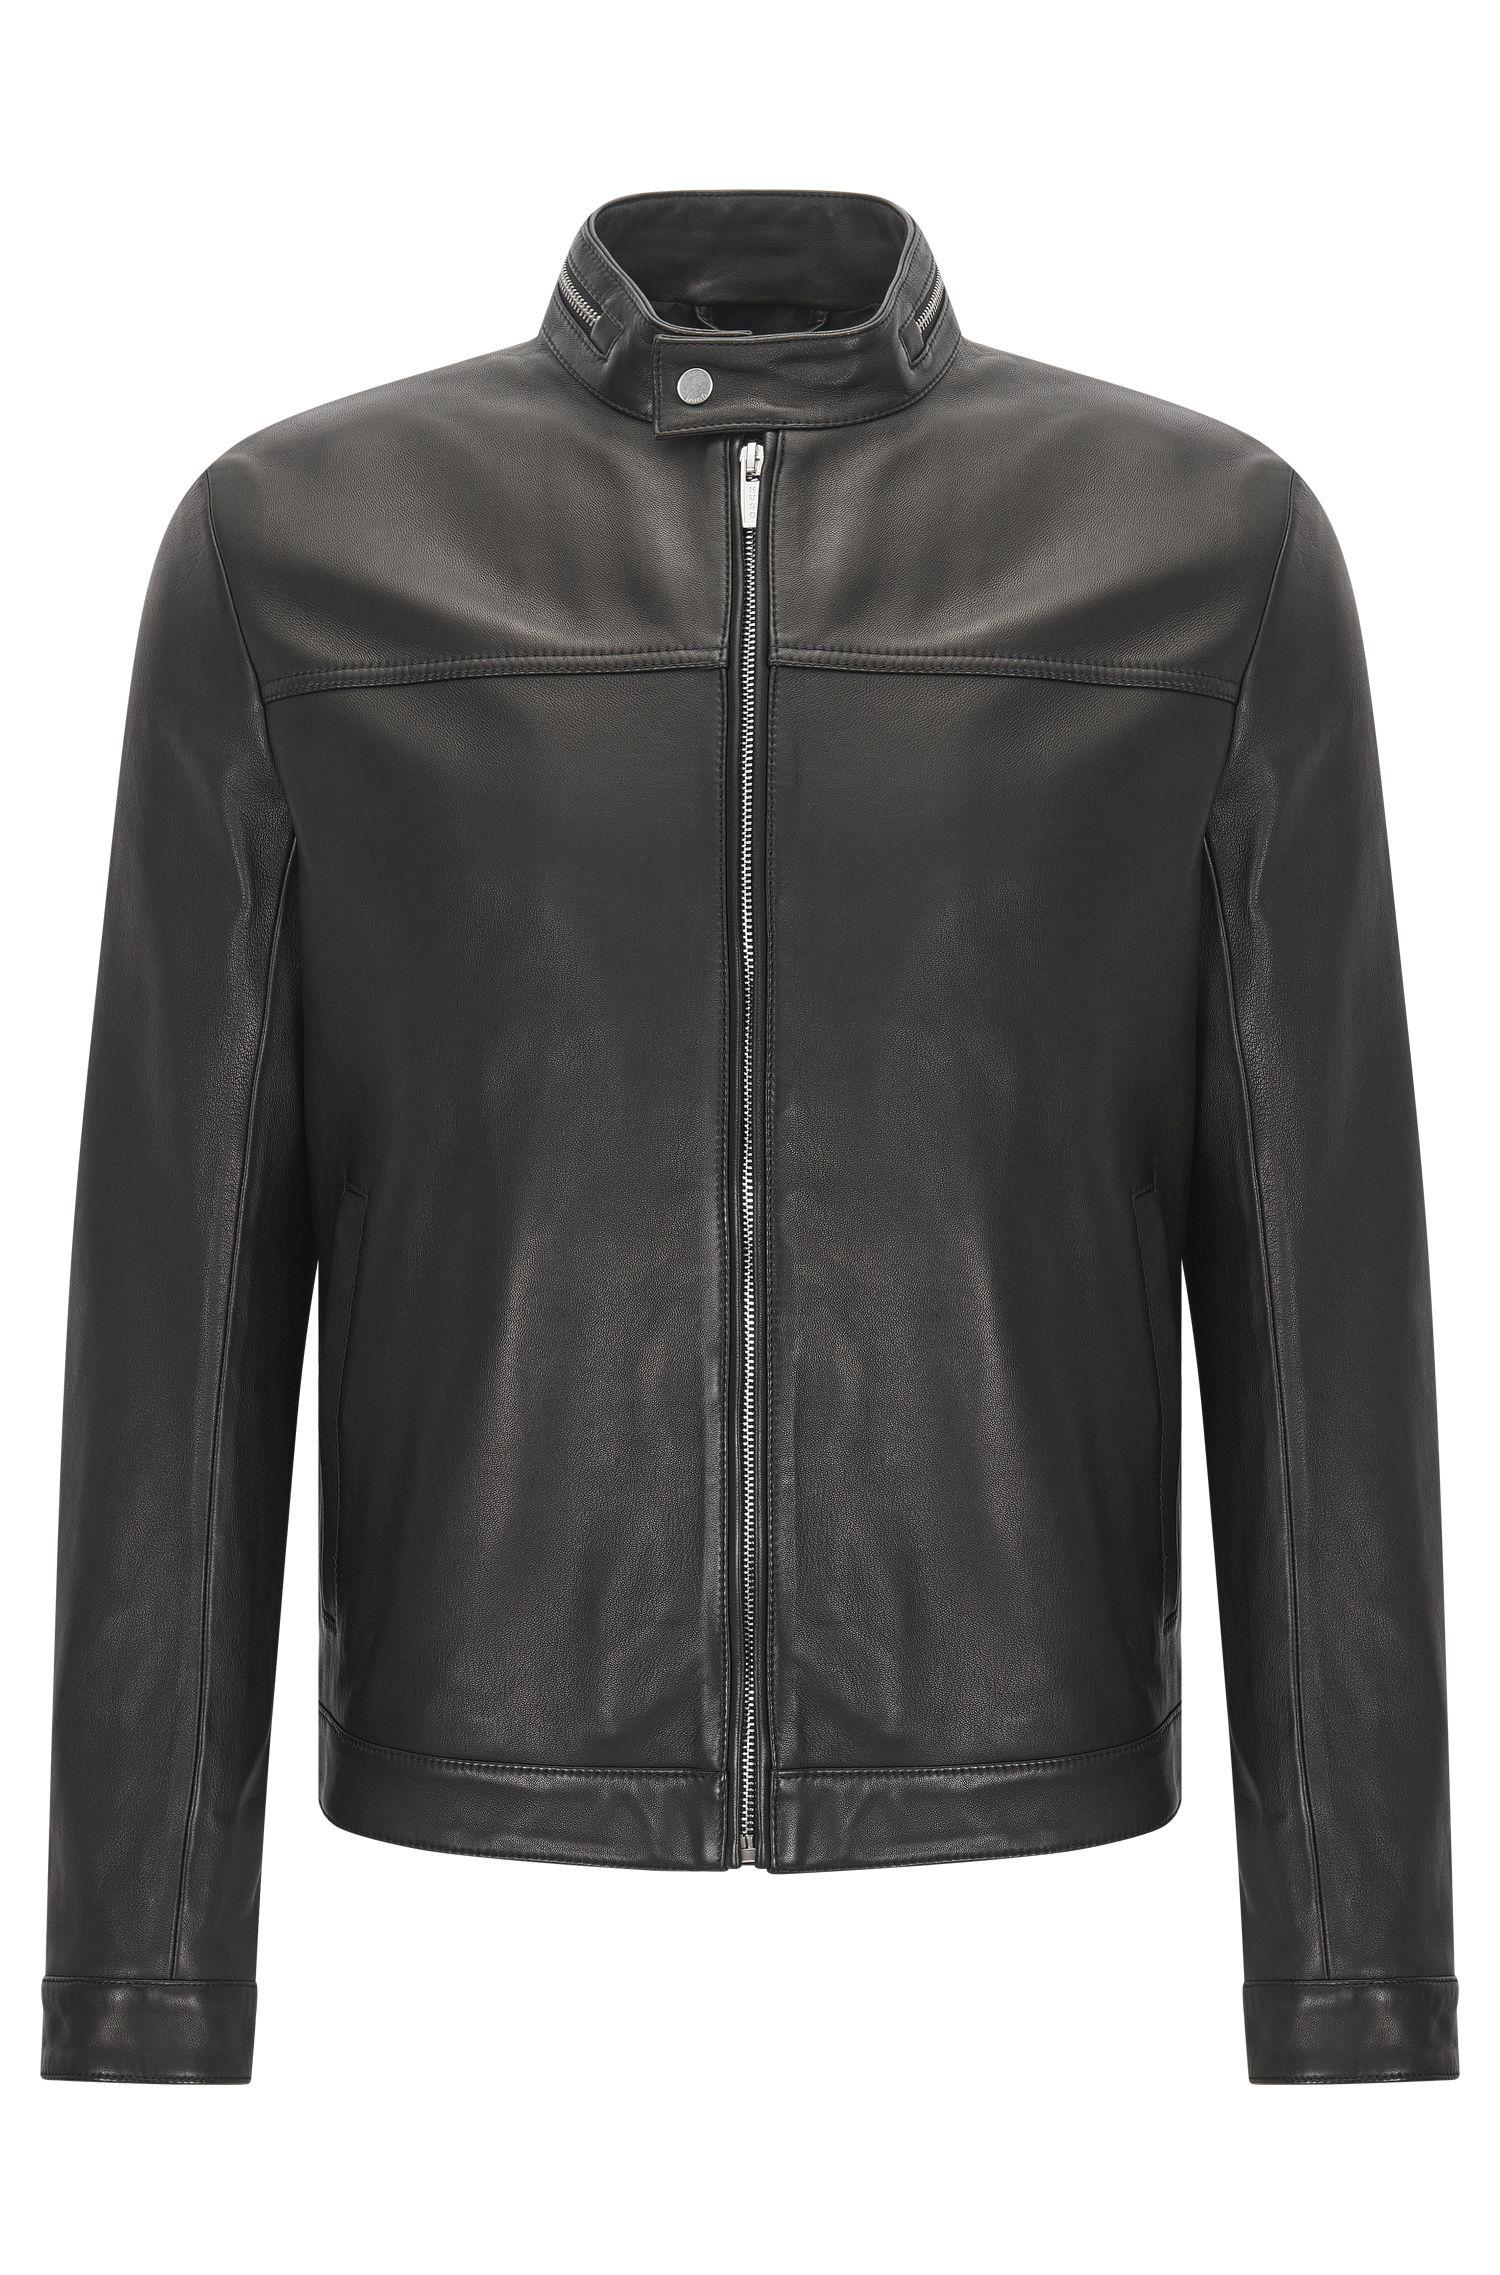 'Luckas' | Lamb Leather Jacket